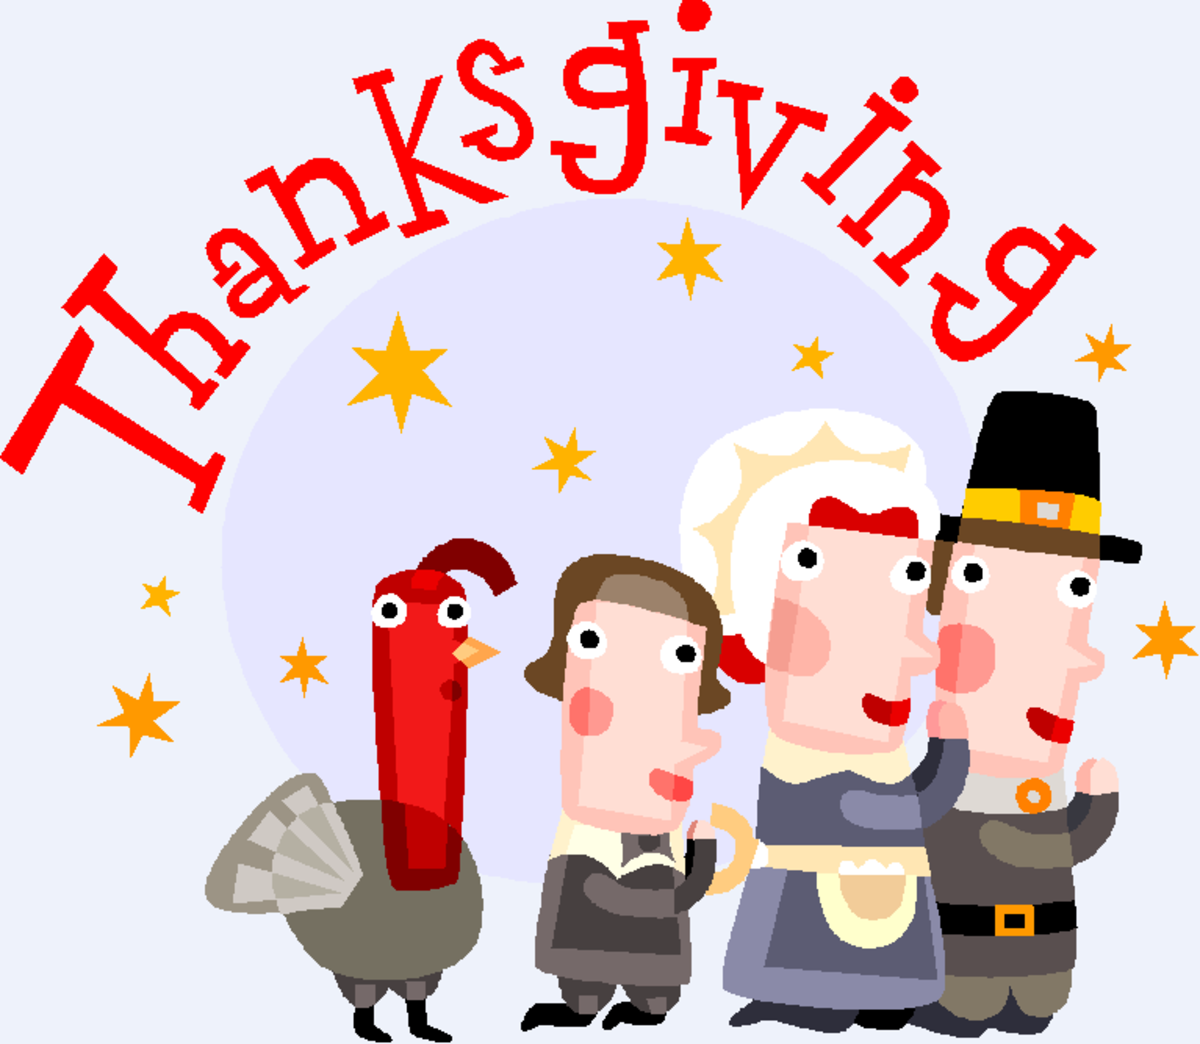 Pilgrims Saying Prayers of Gratitude